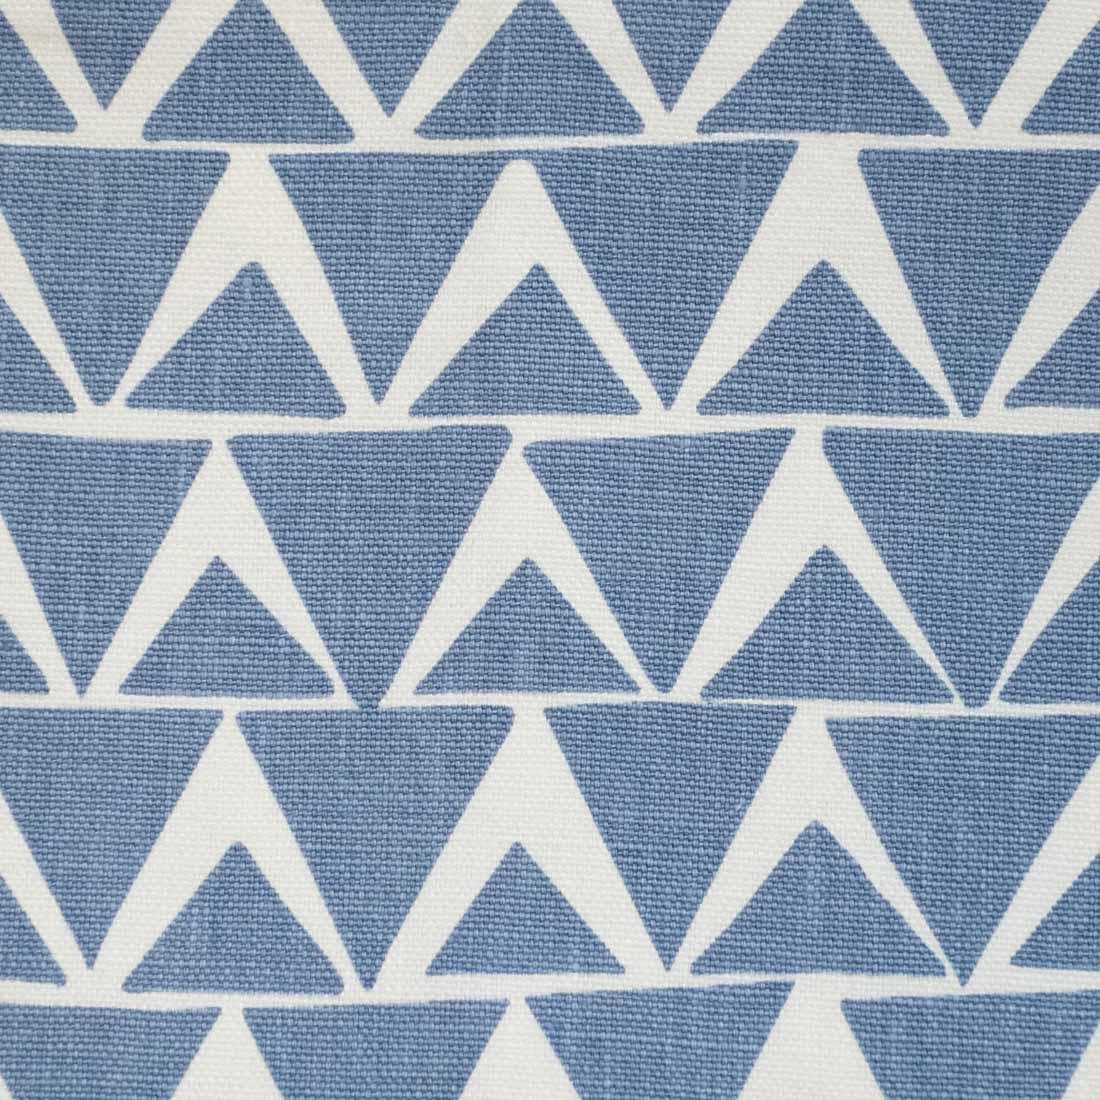 Triangles in Cornflower Blue